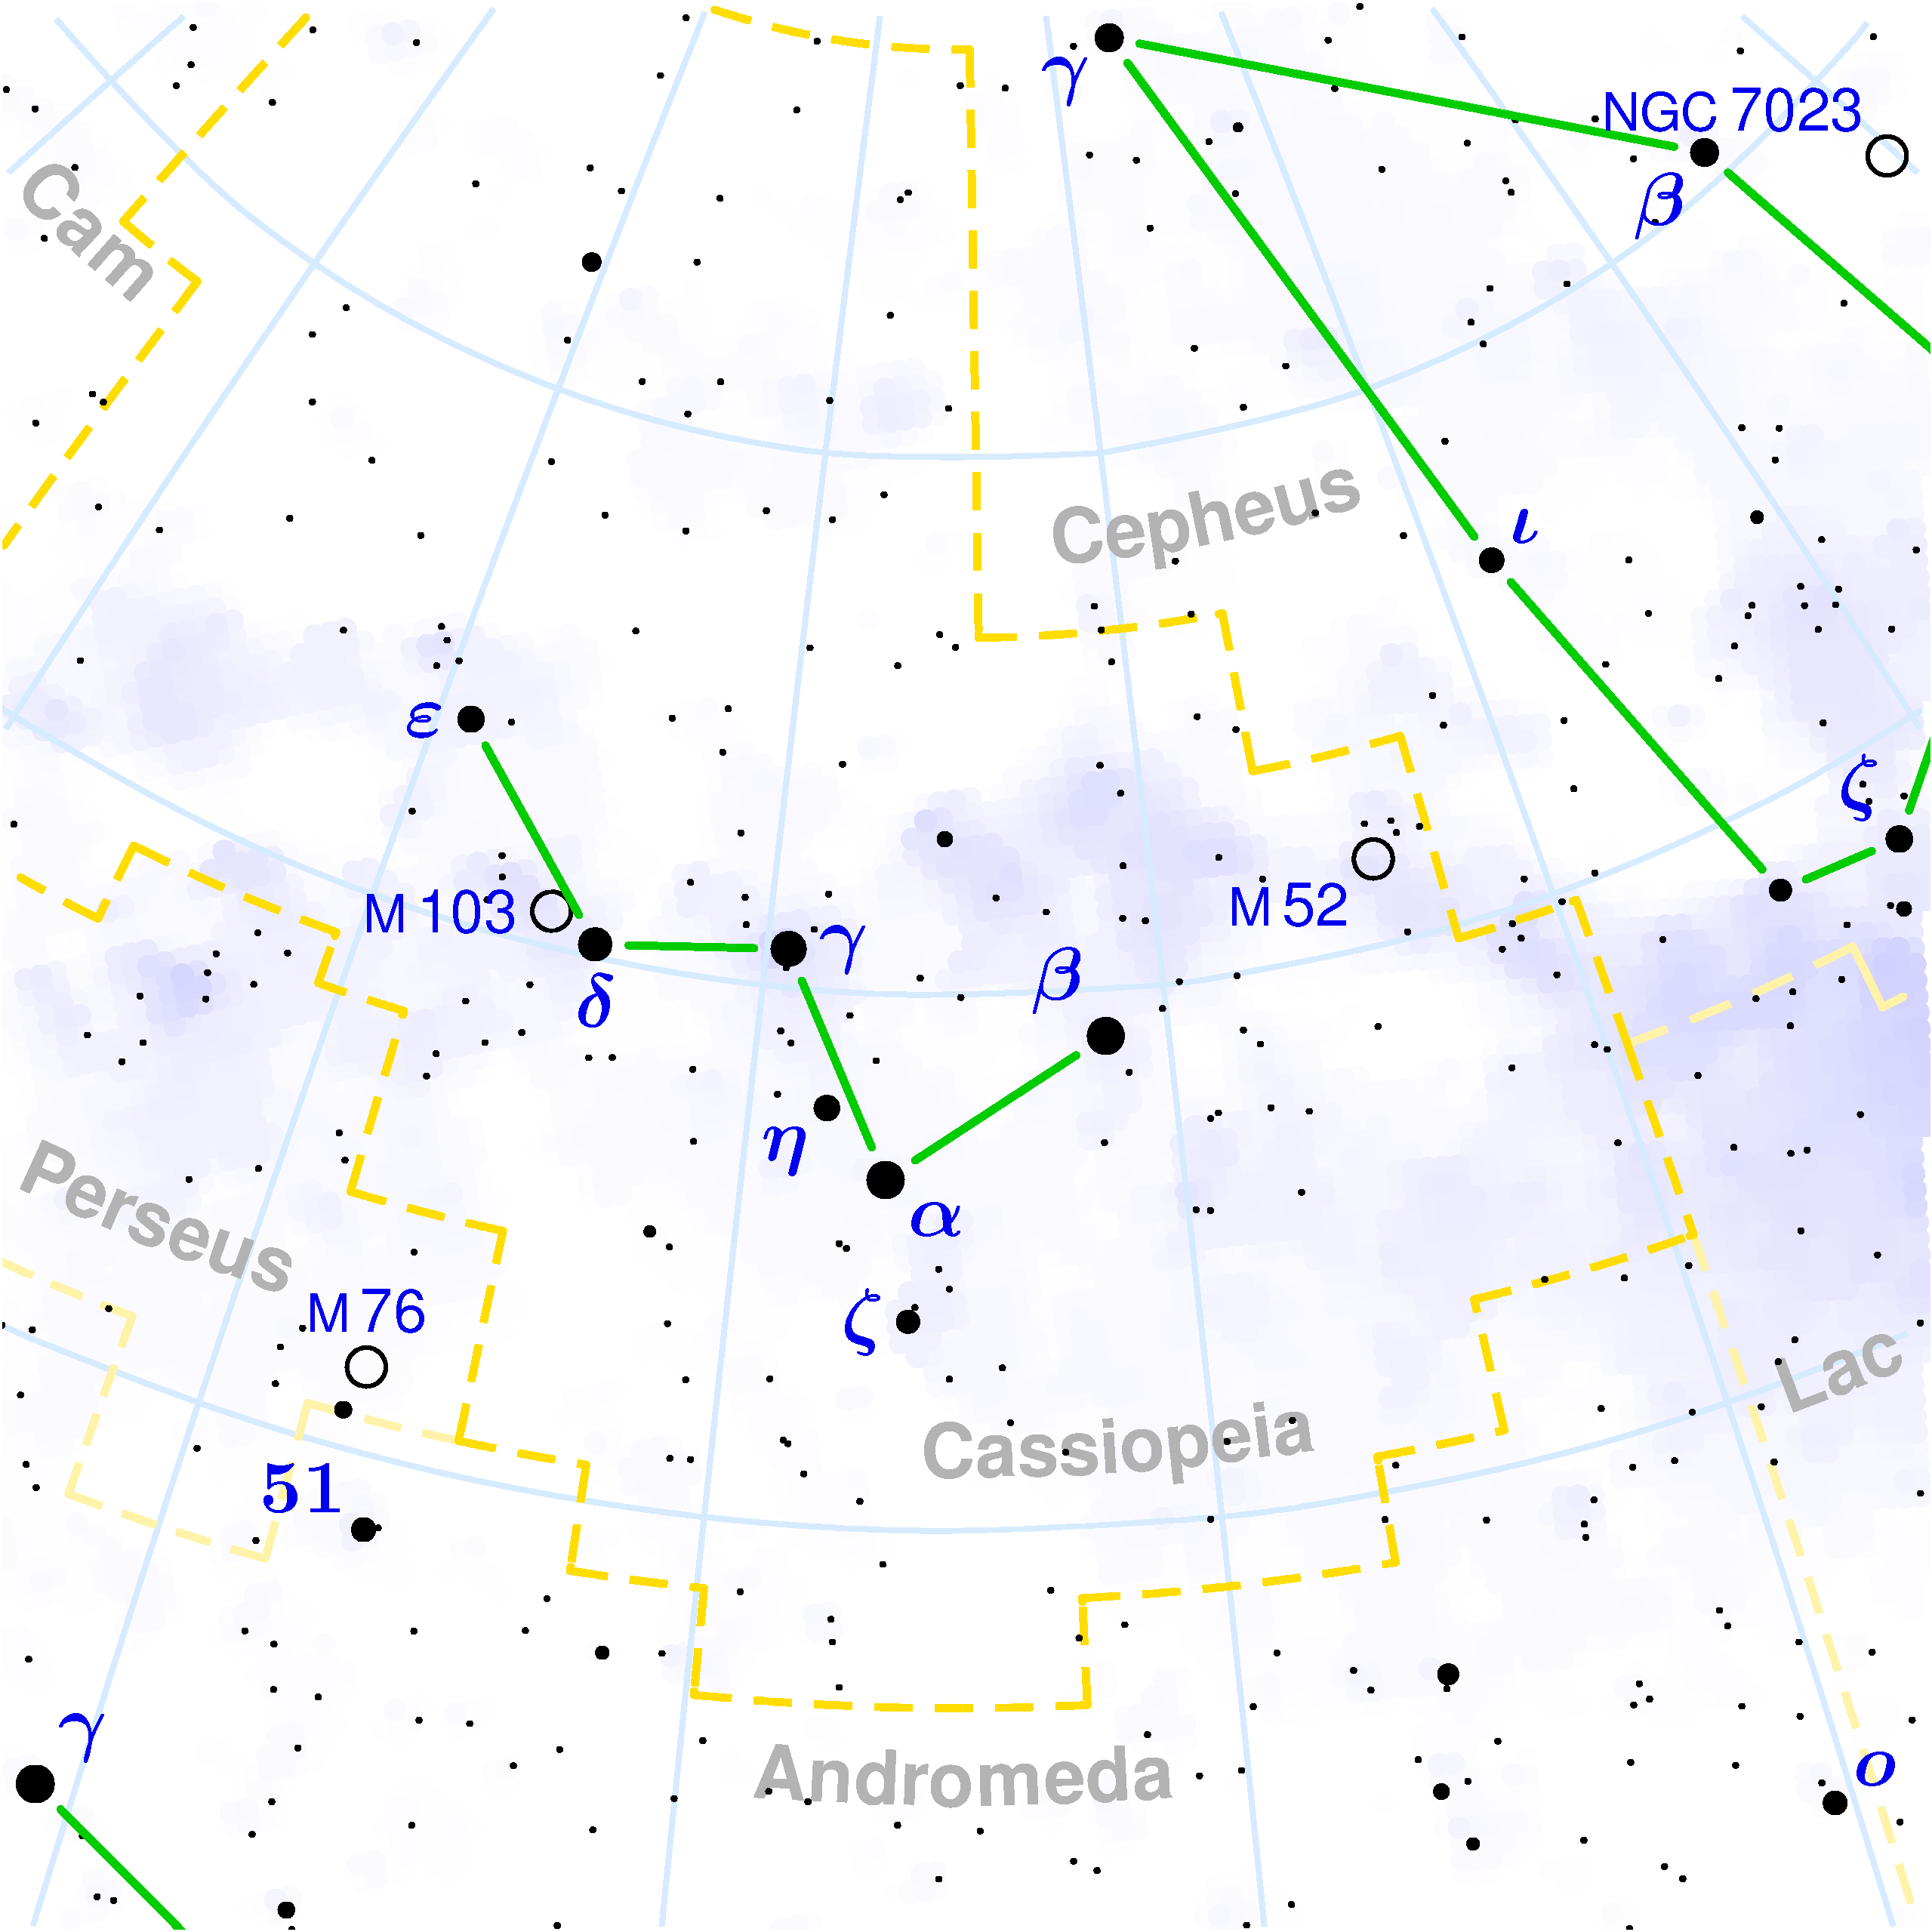 Cassiopeia constellation.  η Cas is a binary star. Image. Torsten Bronger, Wikimedia.